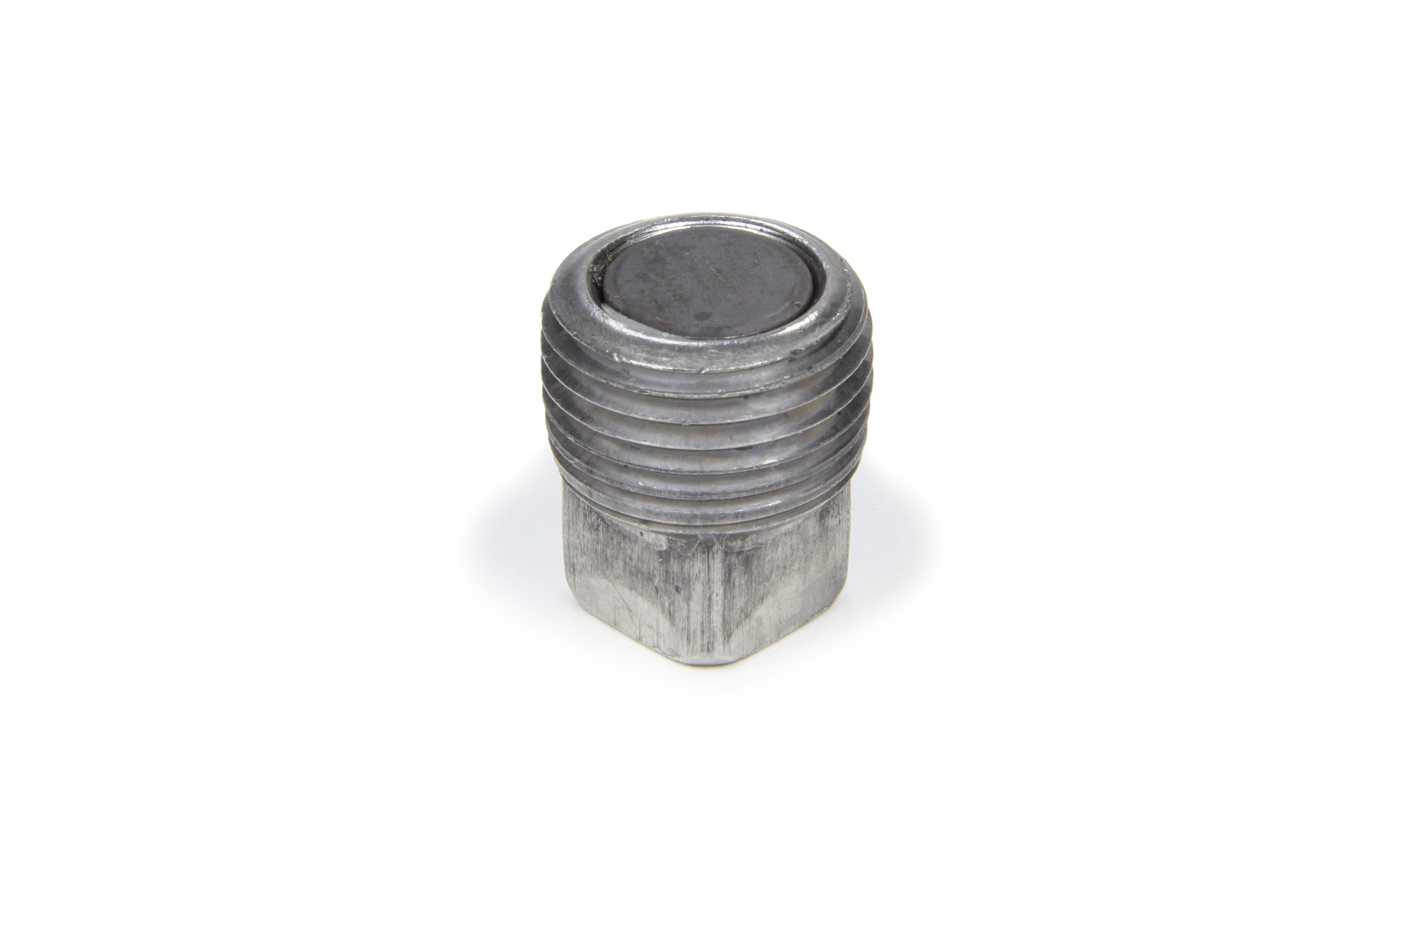 Trans Dapt 9064 Drain Plug, 1/2 in NPT, Square Head, Magnetic, Steel, Natural, Each